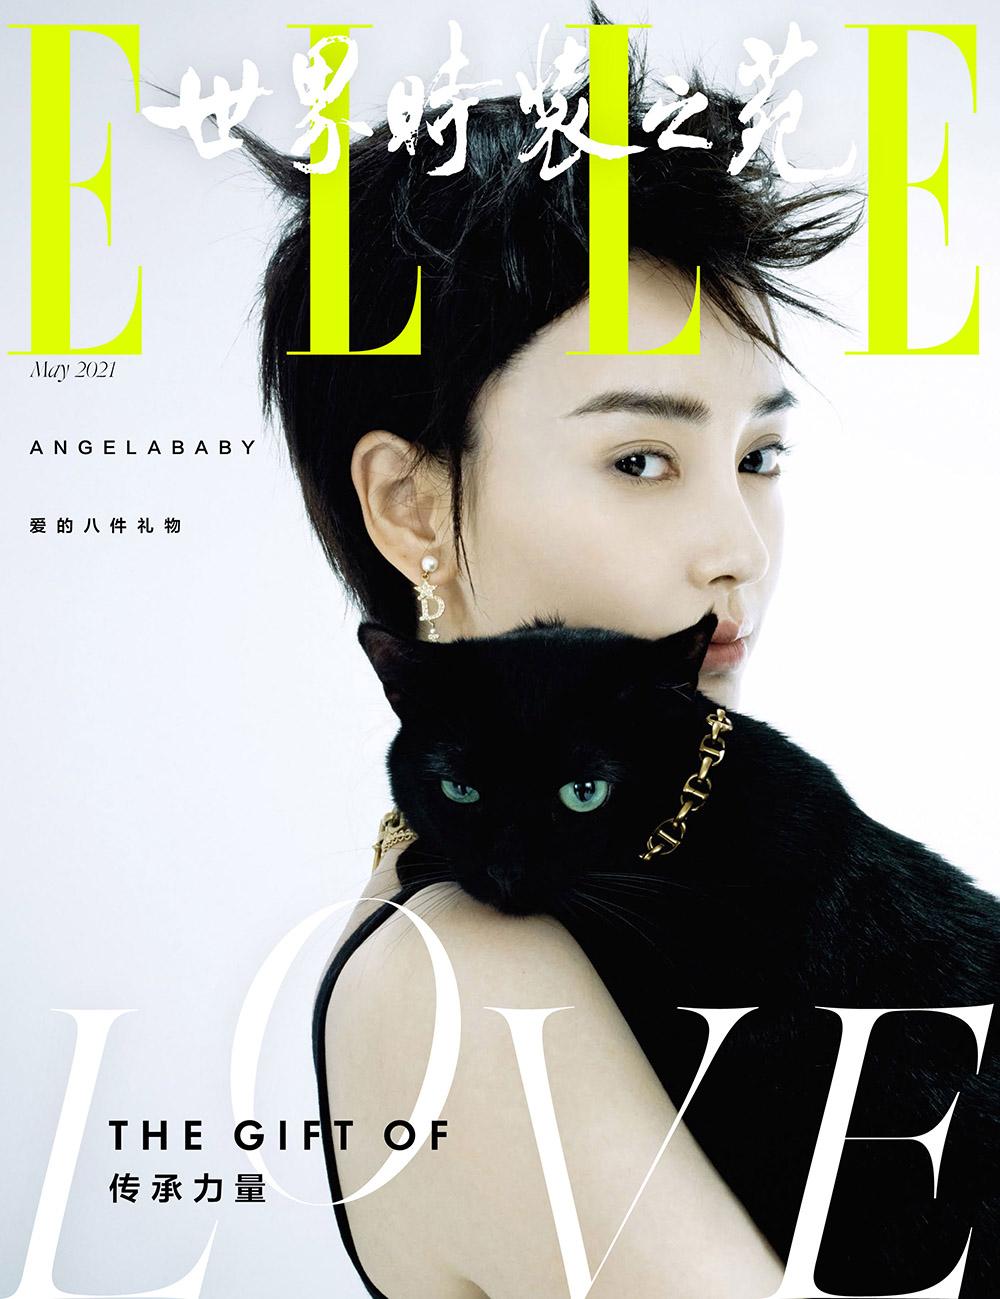 Angelababy短发黑猫封面.jpg